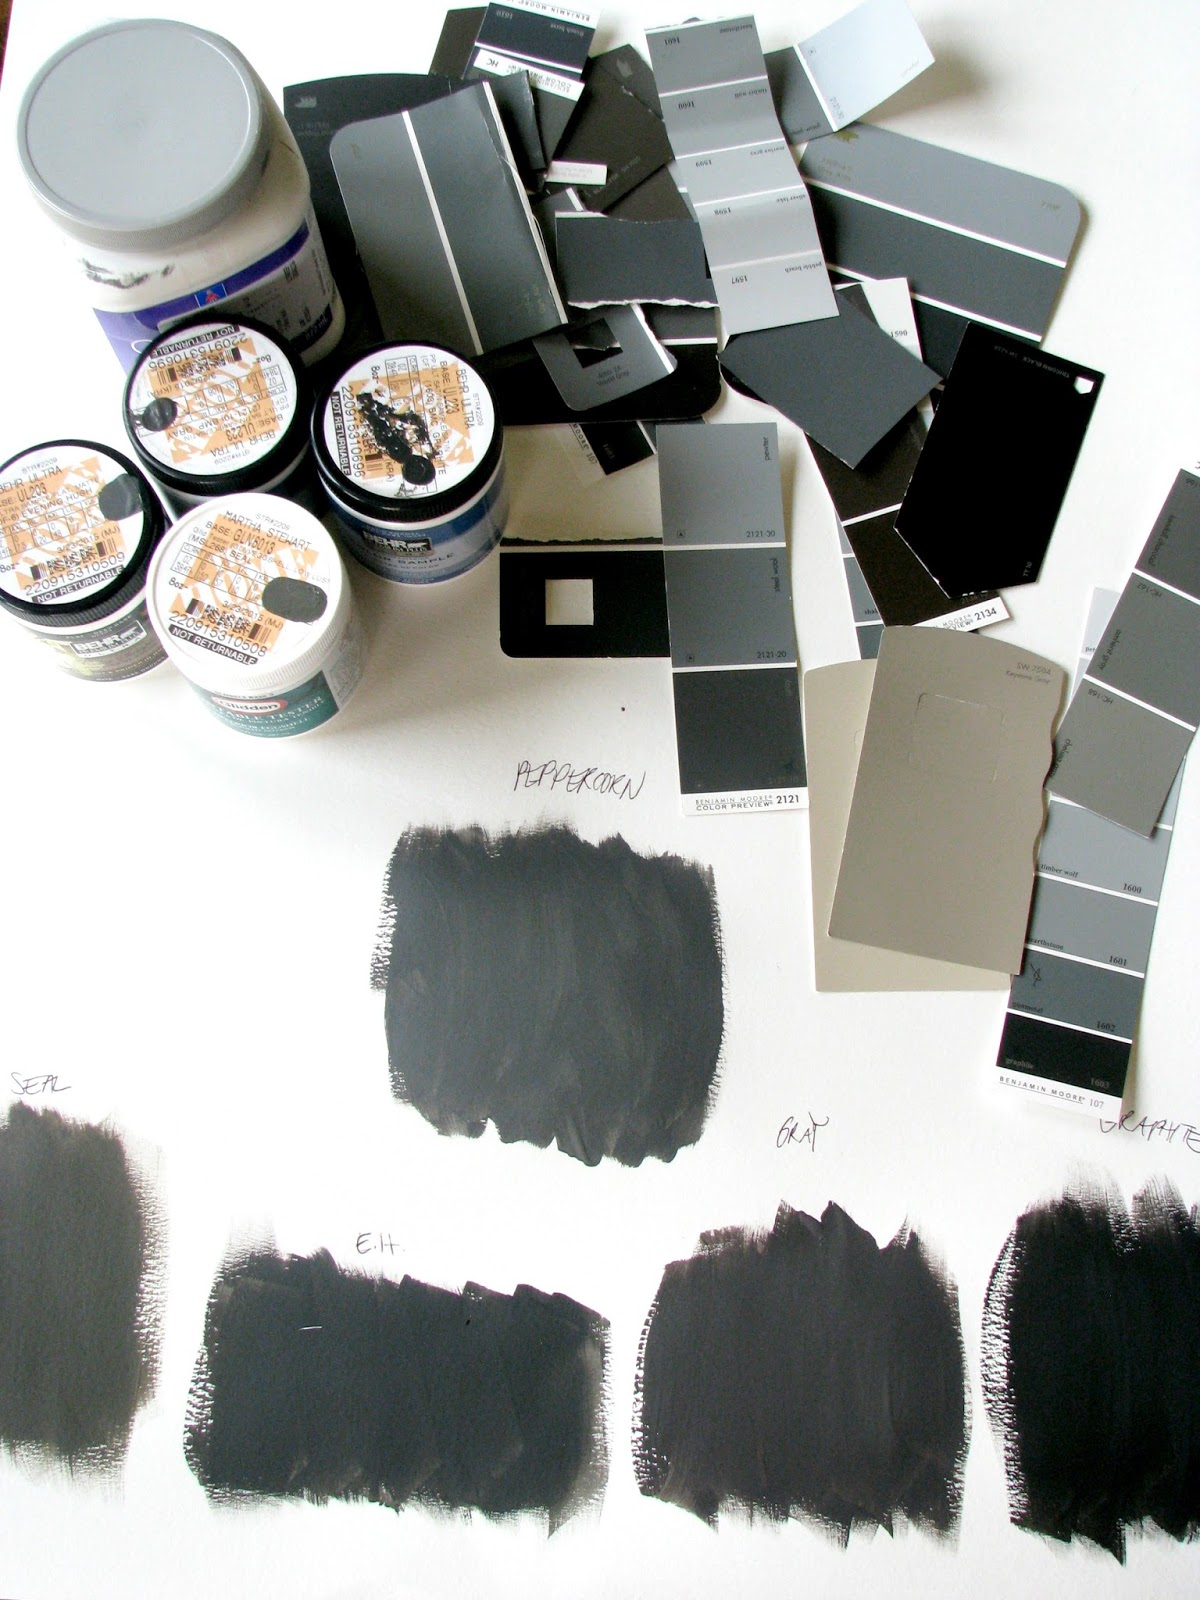 Life love larson dark charcoal paint decision dark charcoal paint decision rubansaba